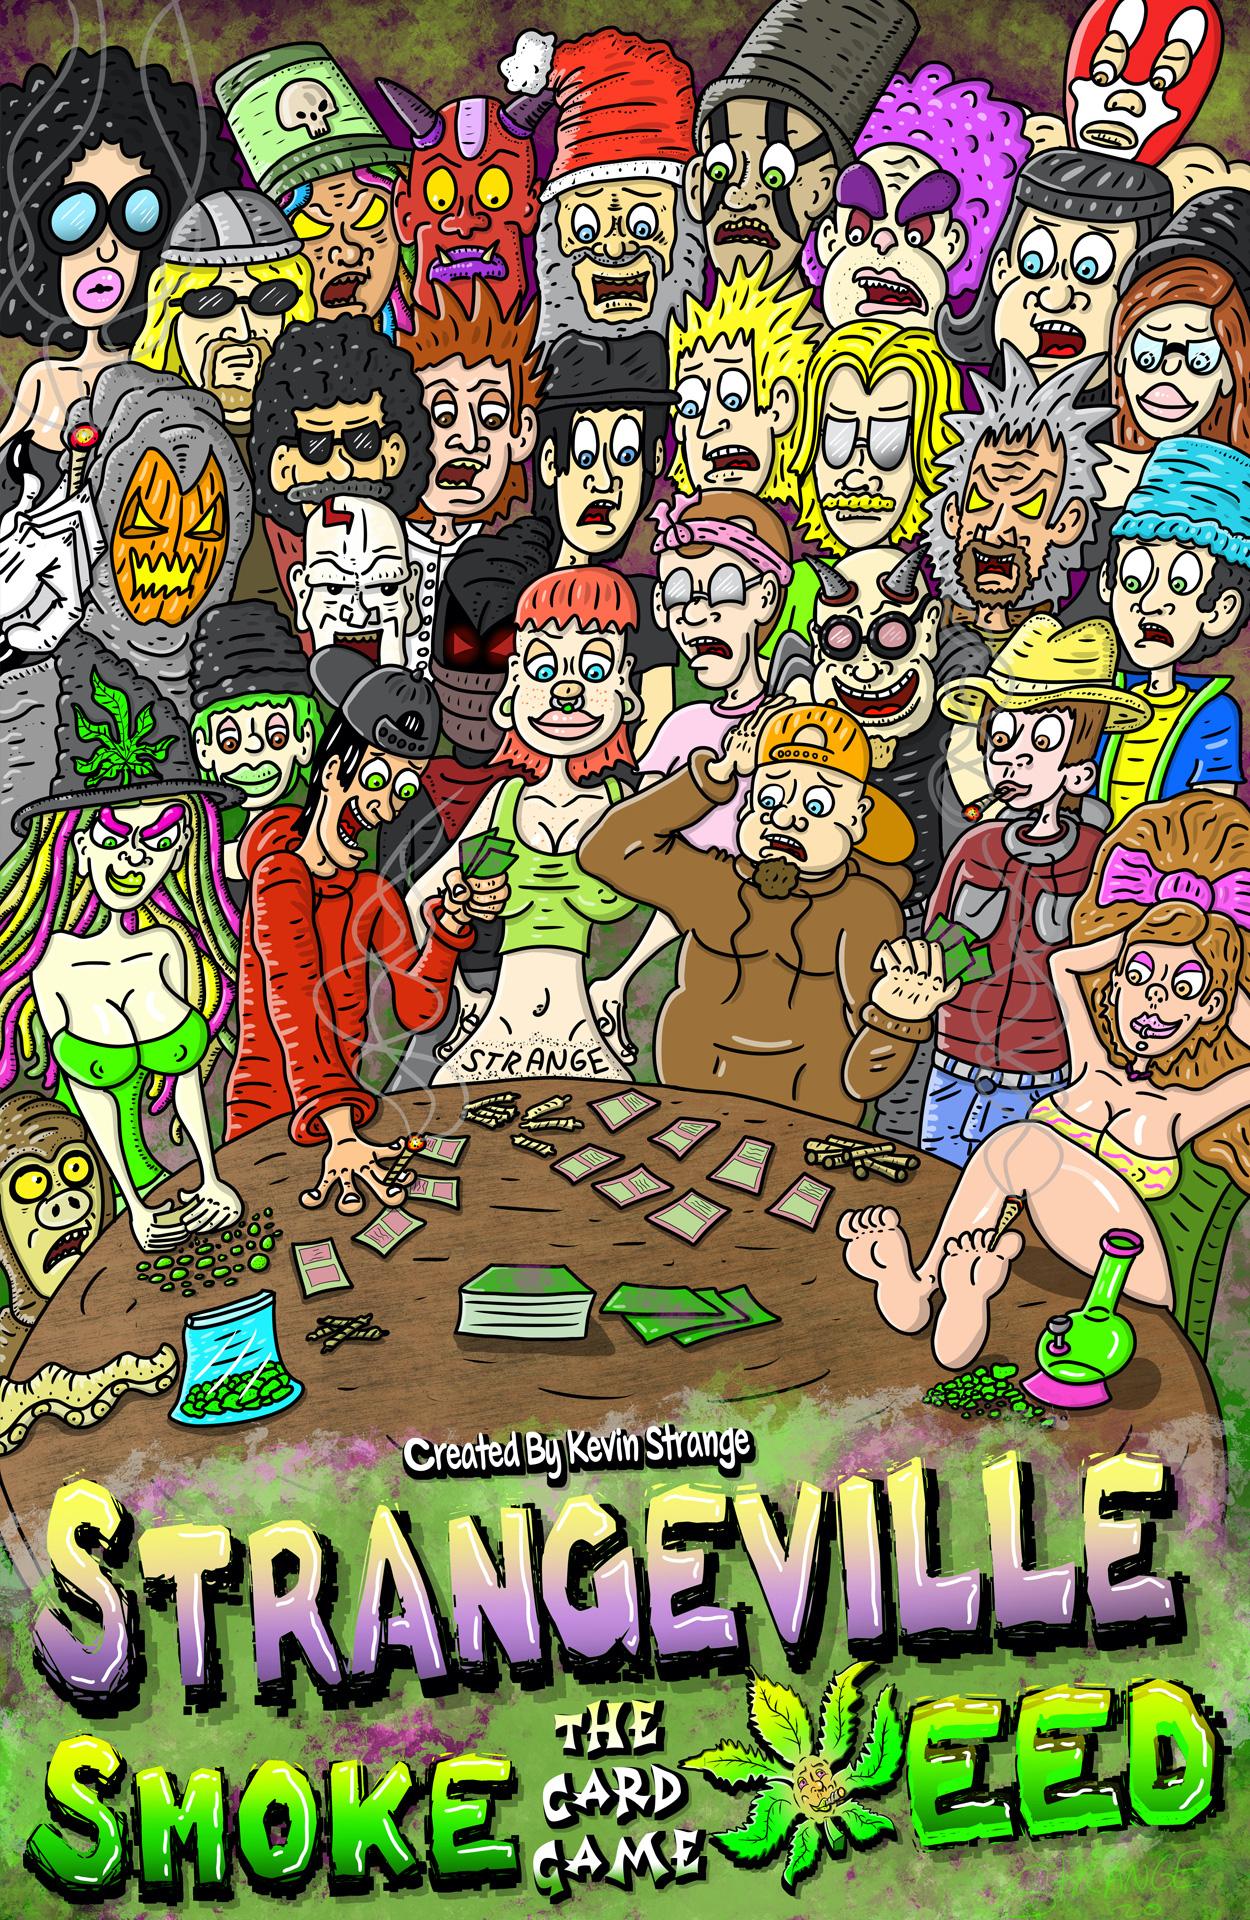 Strangeville Smoke Weed: The Card Game